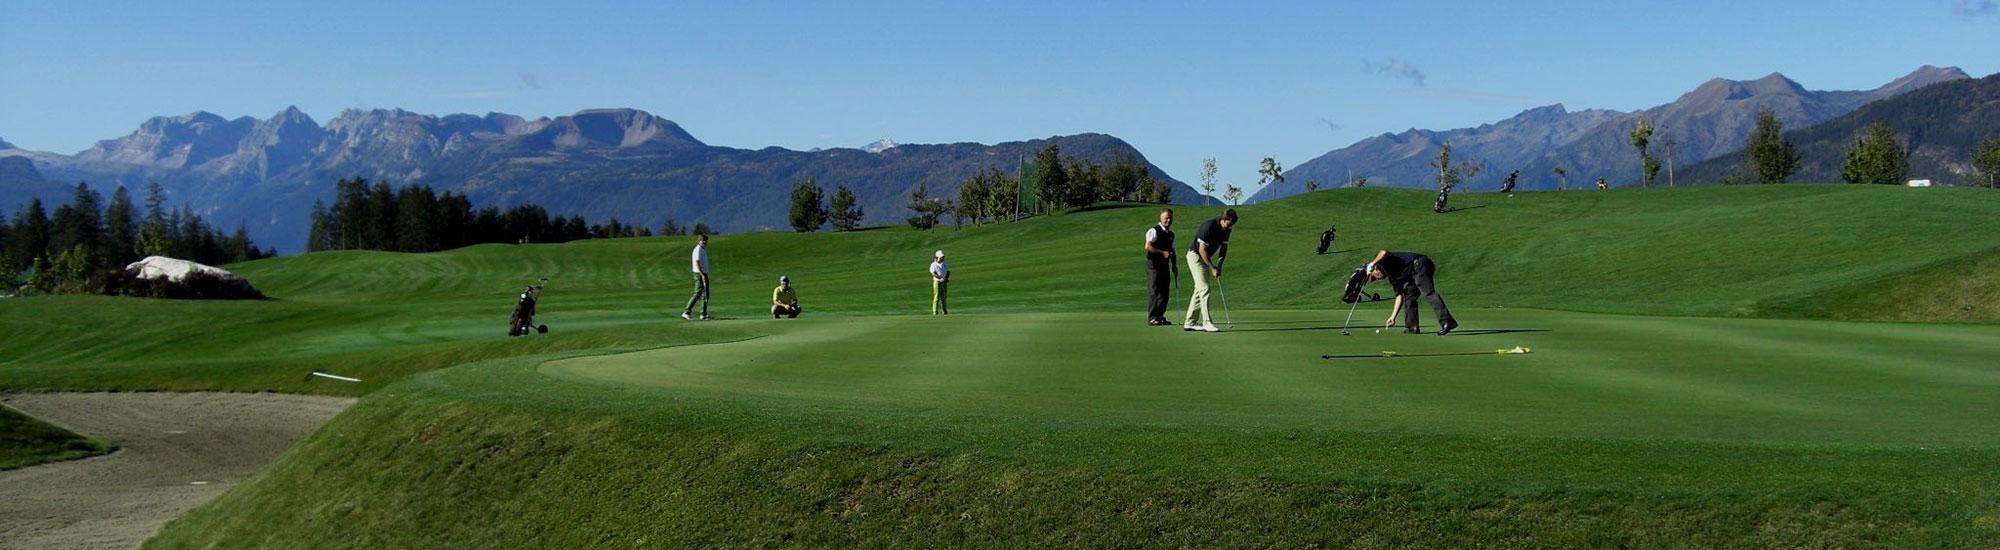 formule di gioco golf